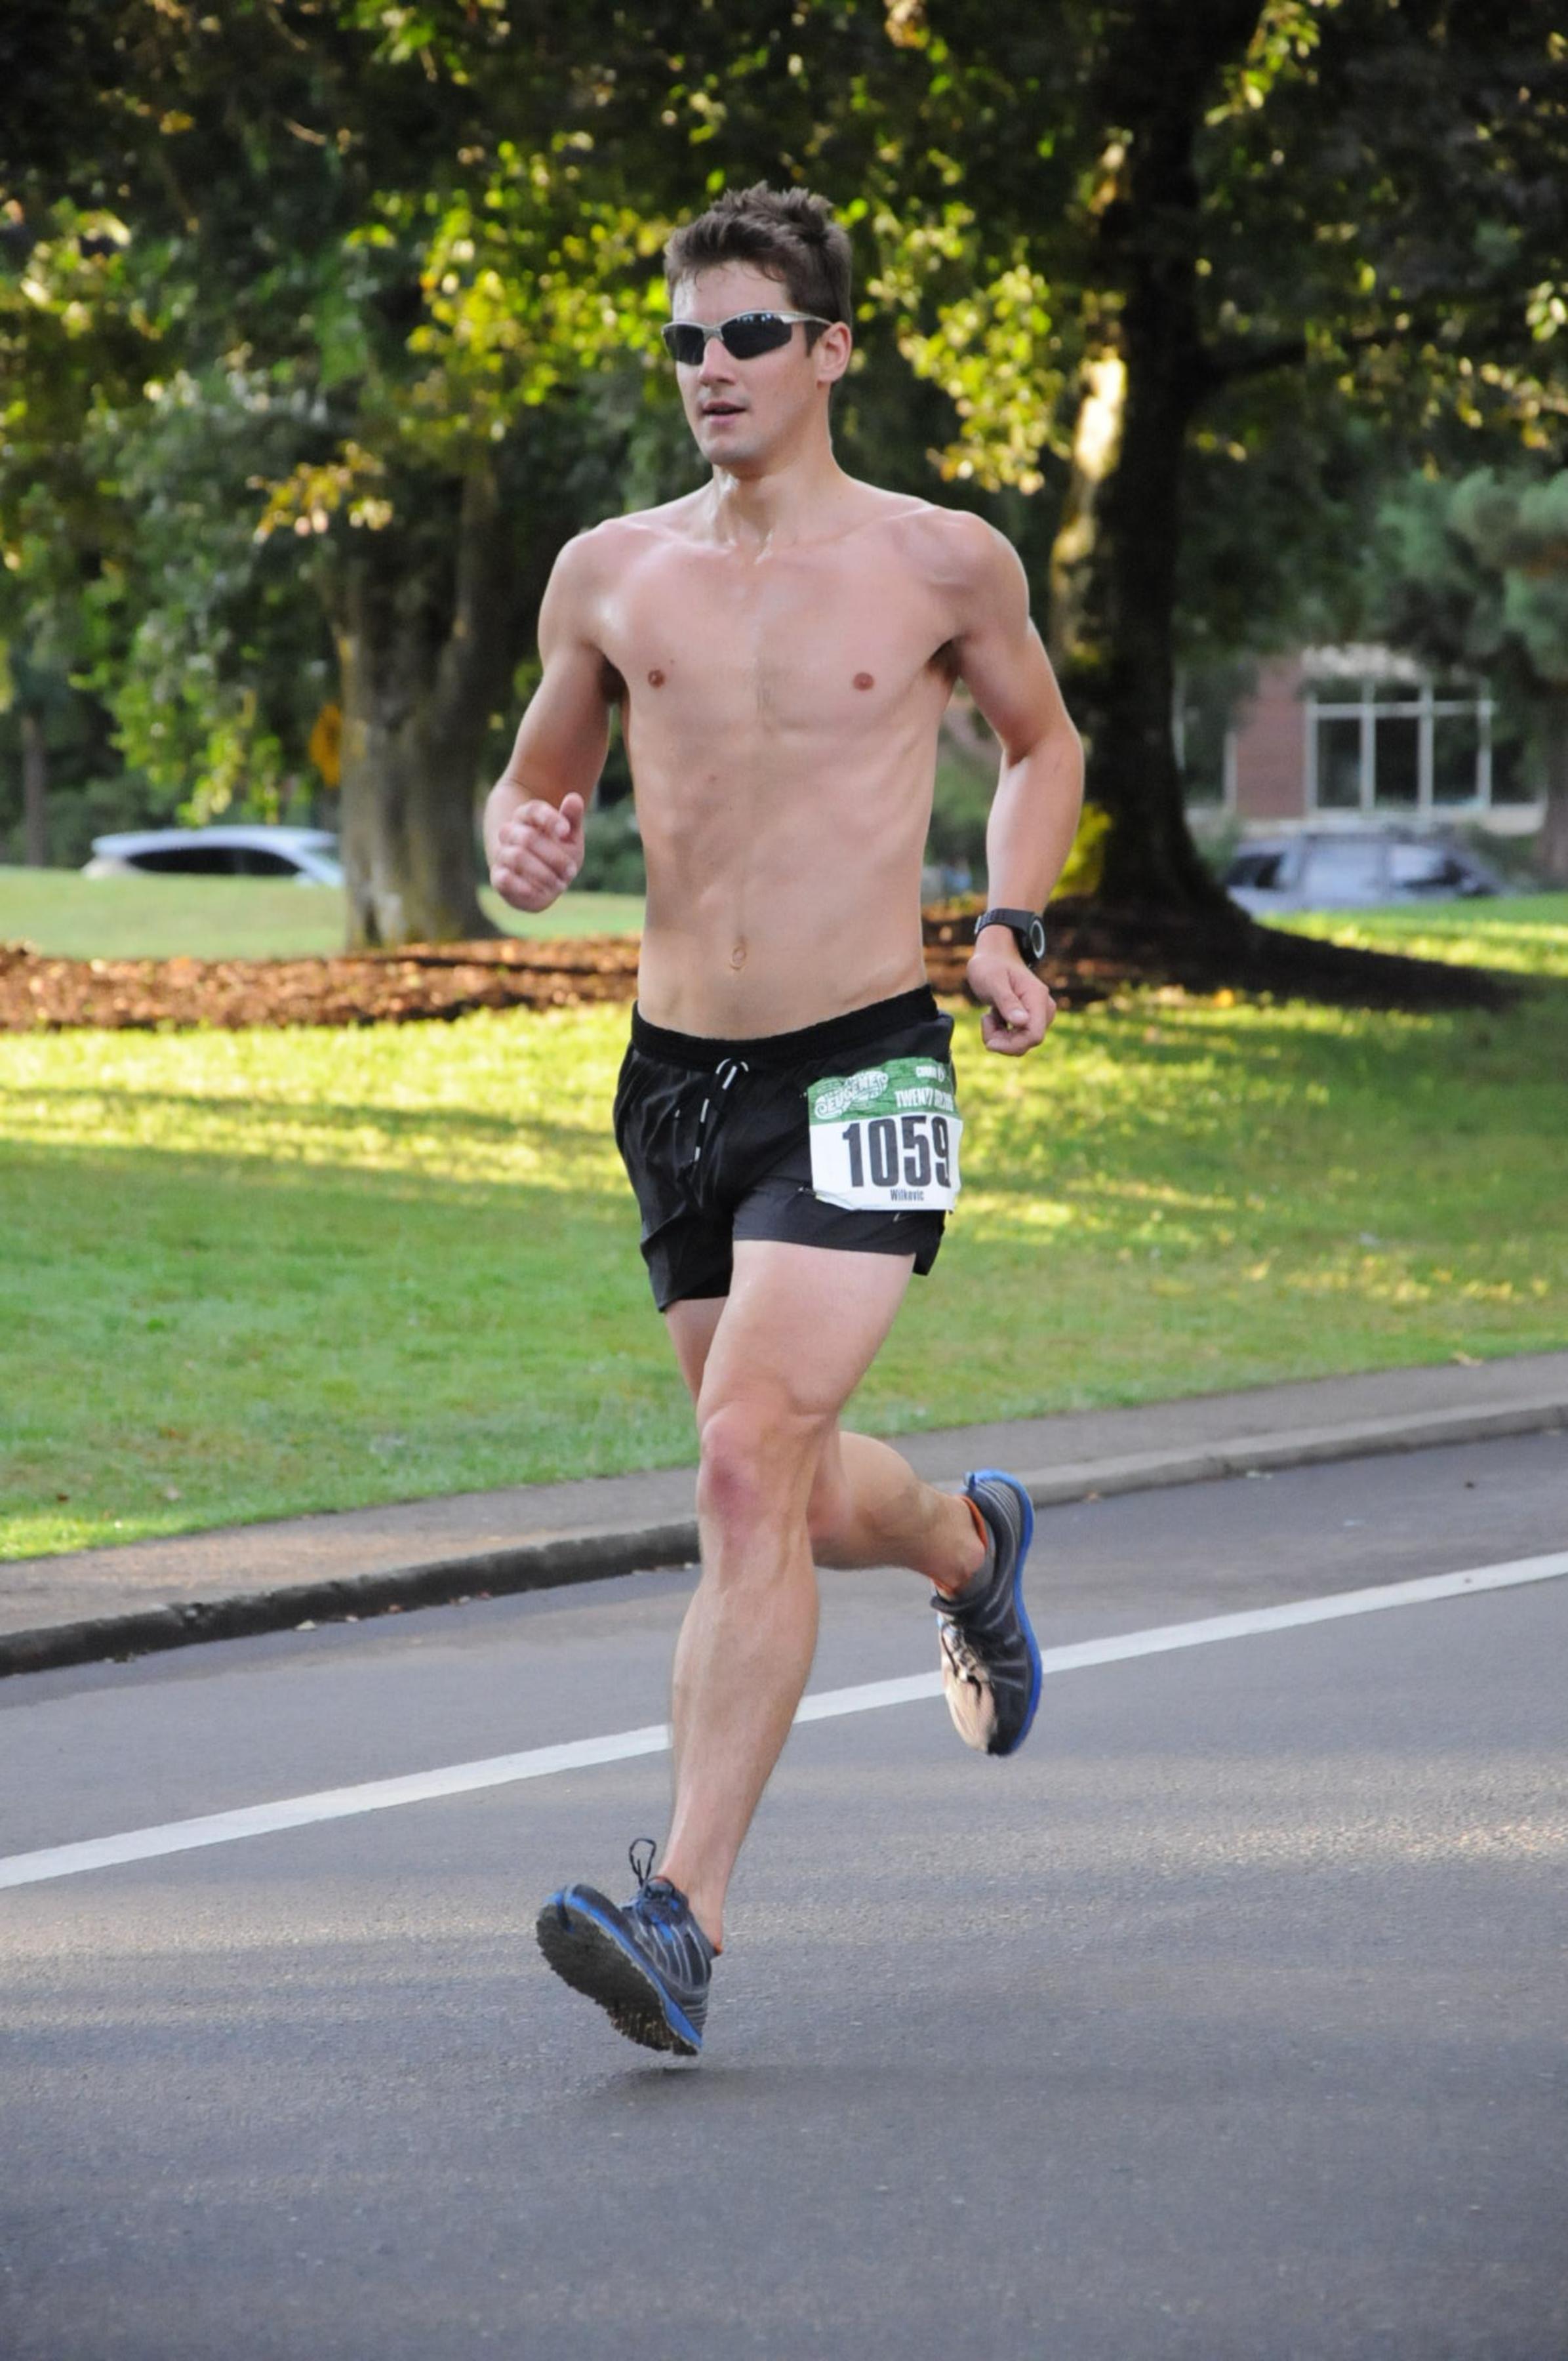 Marathoning With Pure Grit